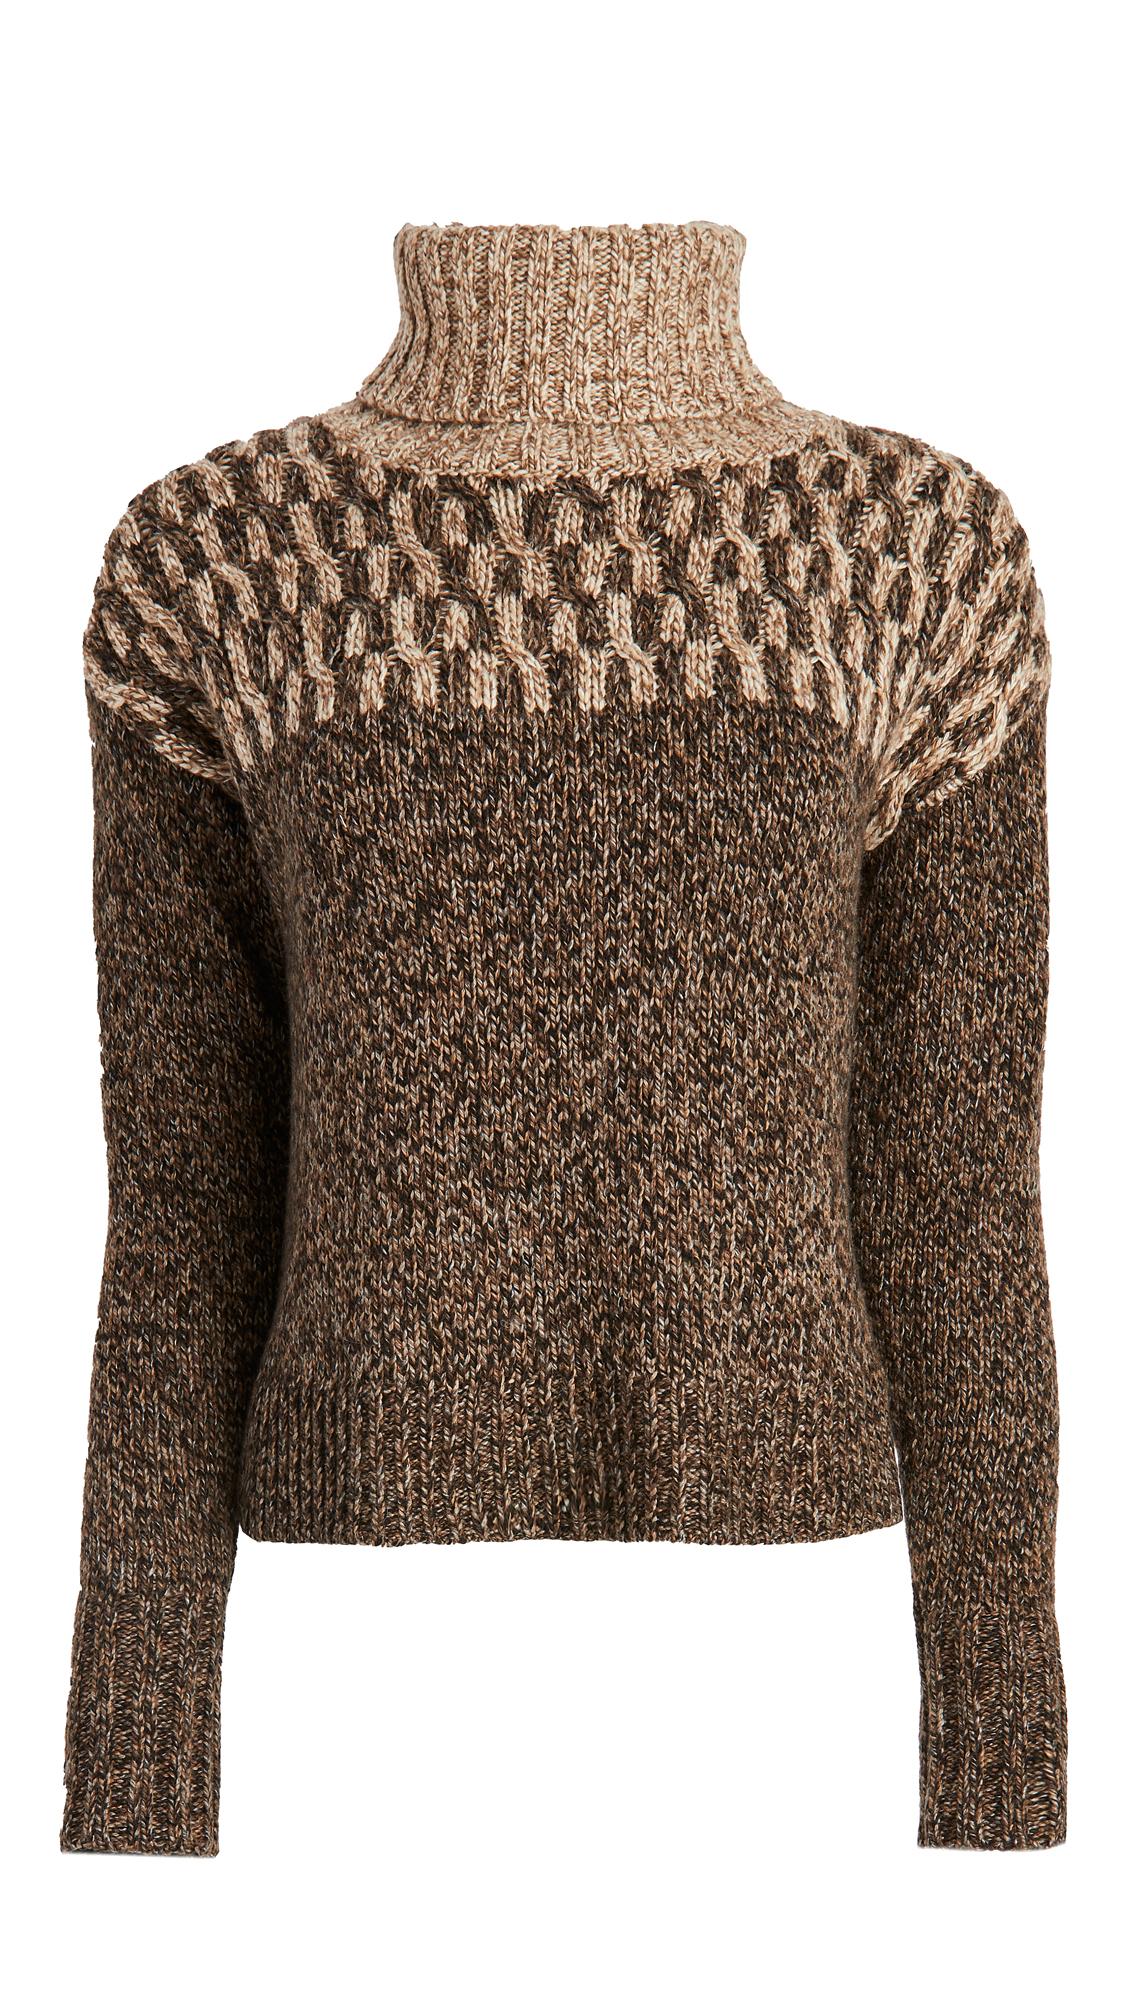 Veronica Beard Bia Turtleneck Sweater